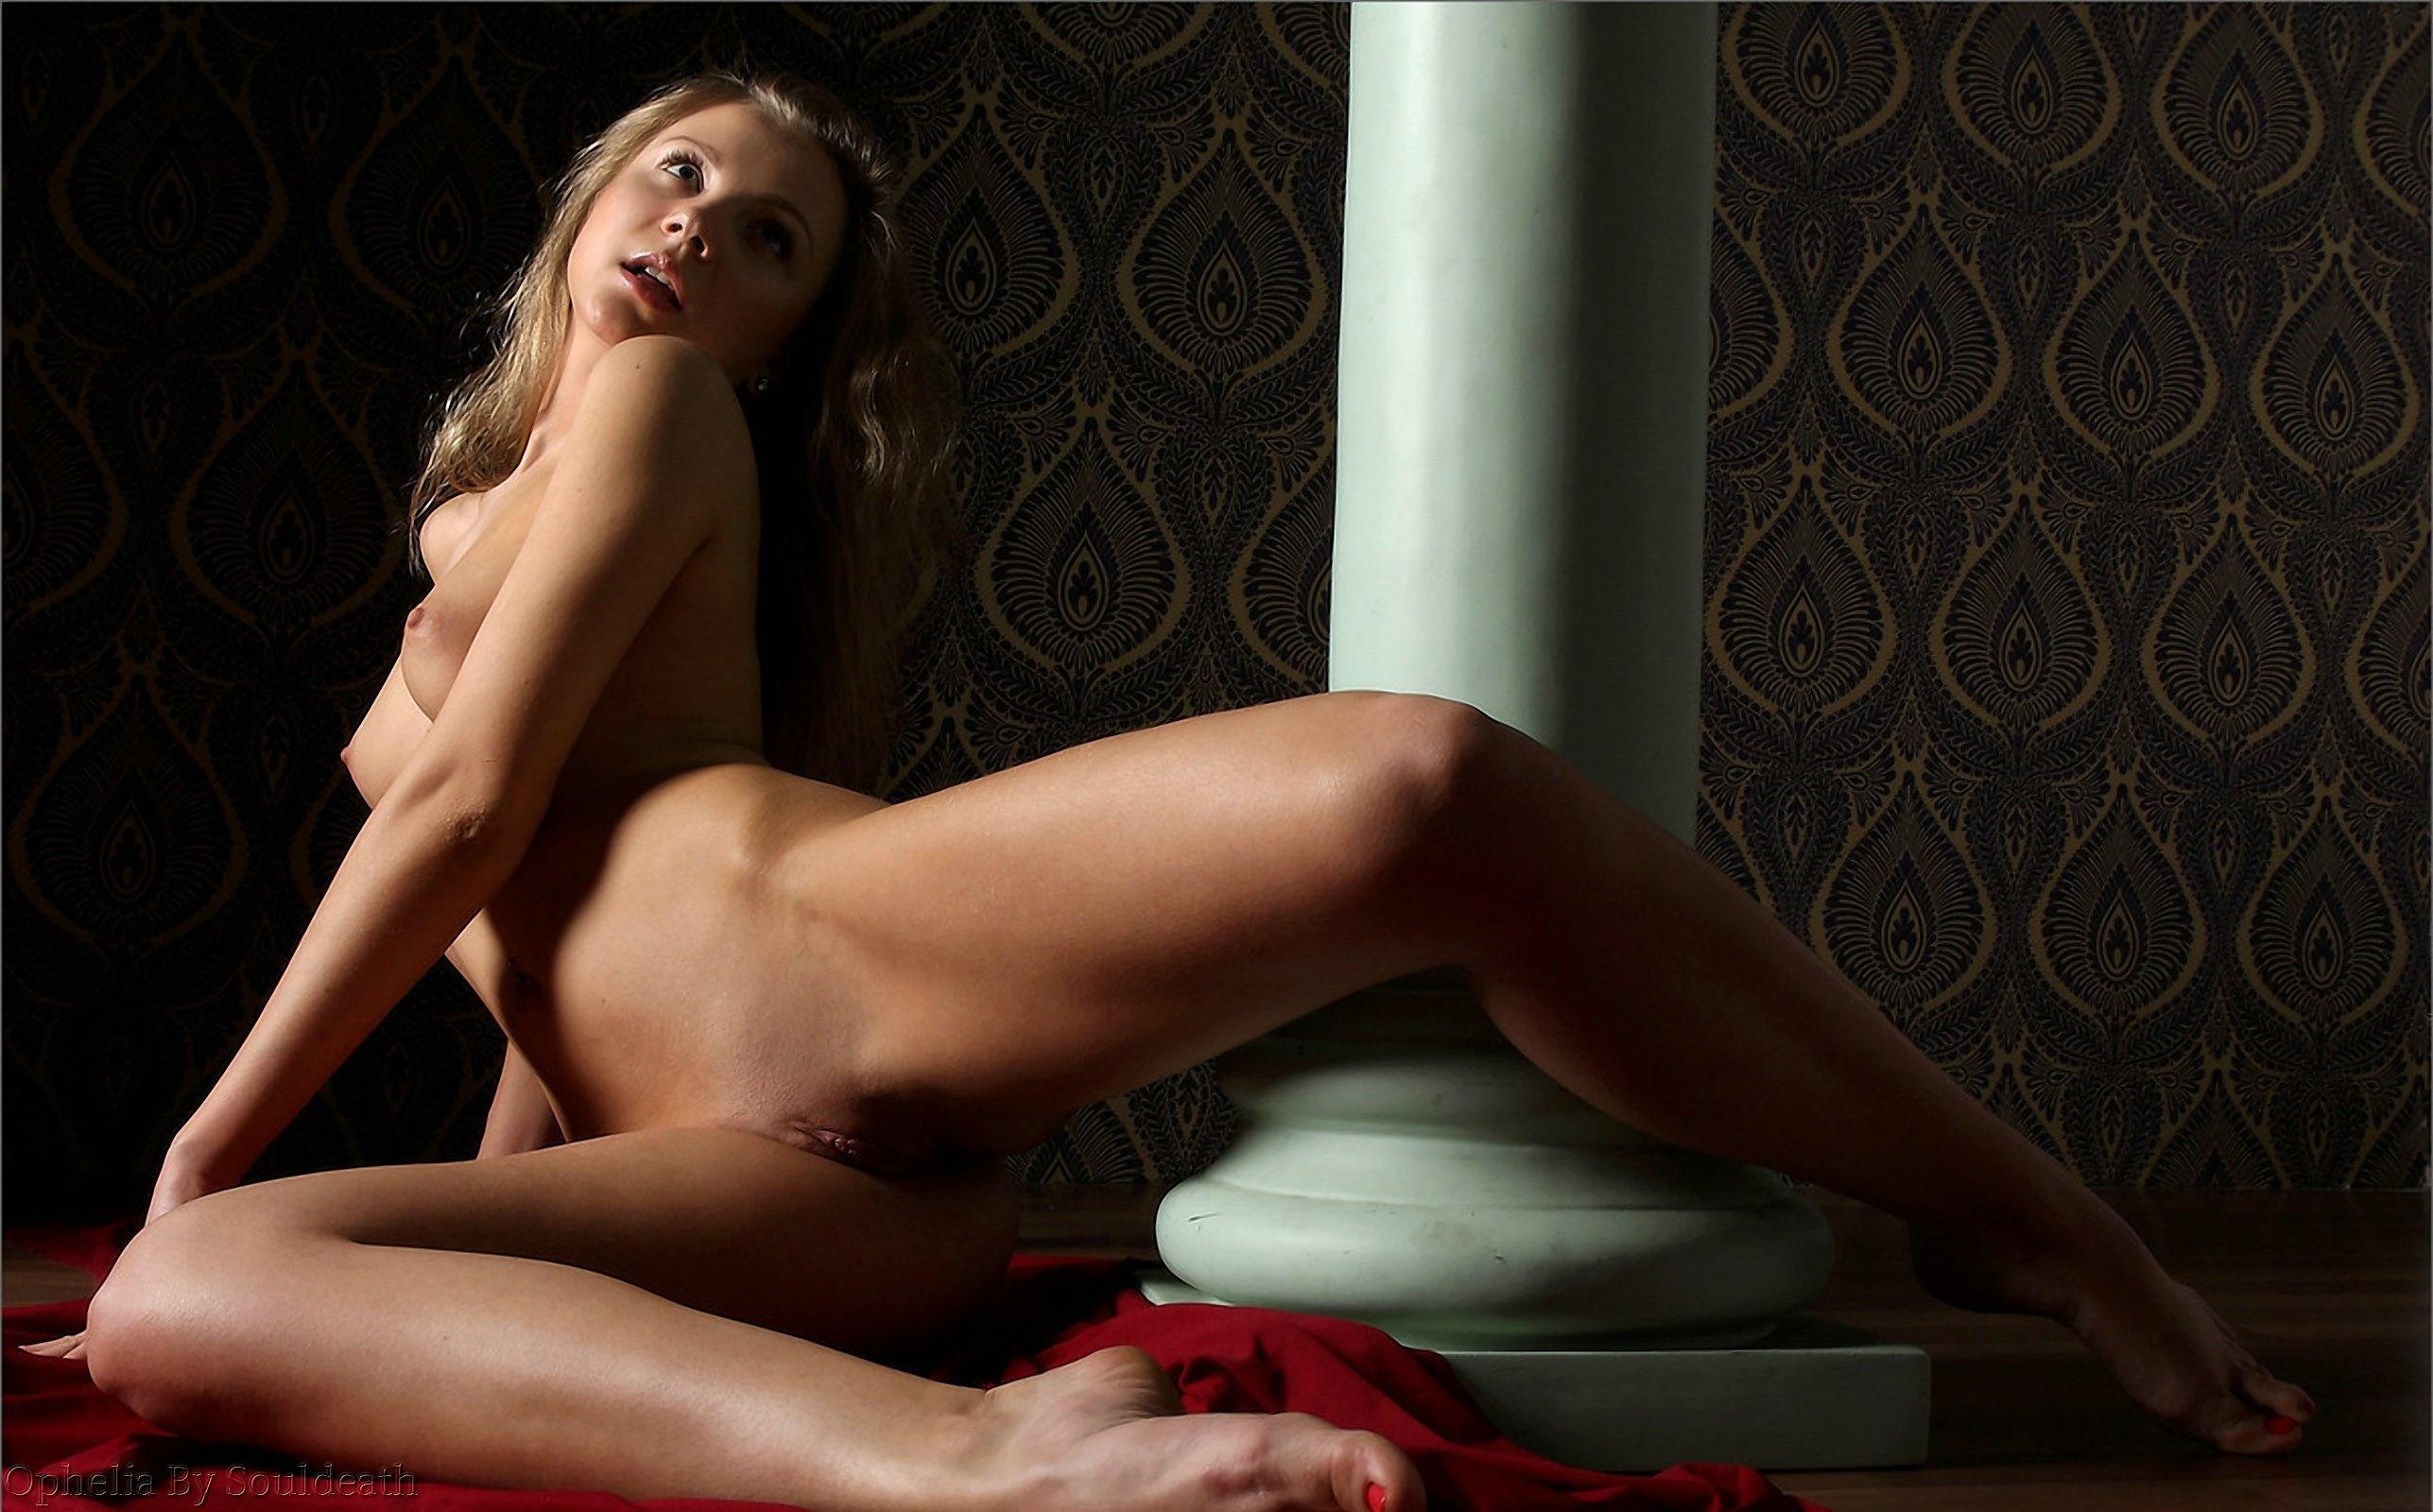 Ophelia nude bj, pornstar cody lan e stripping